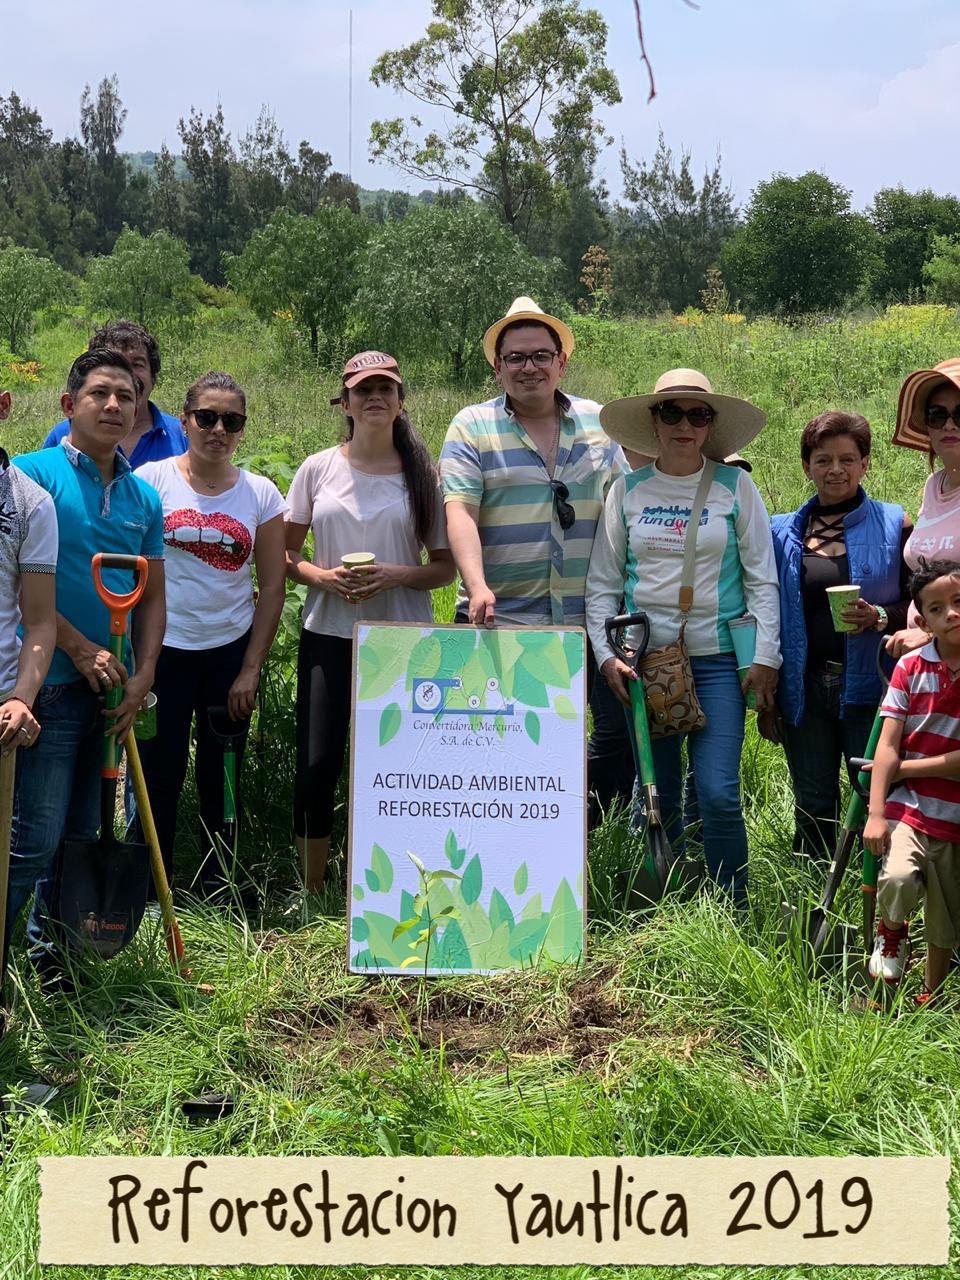 Evento reforestacion yautica 2019